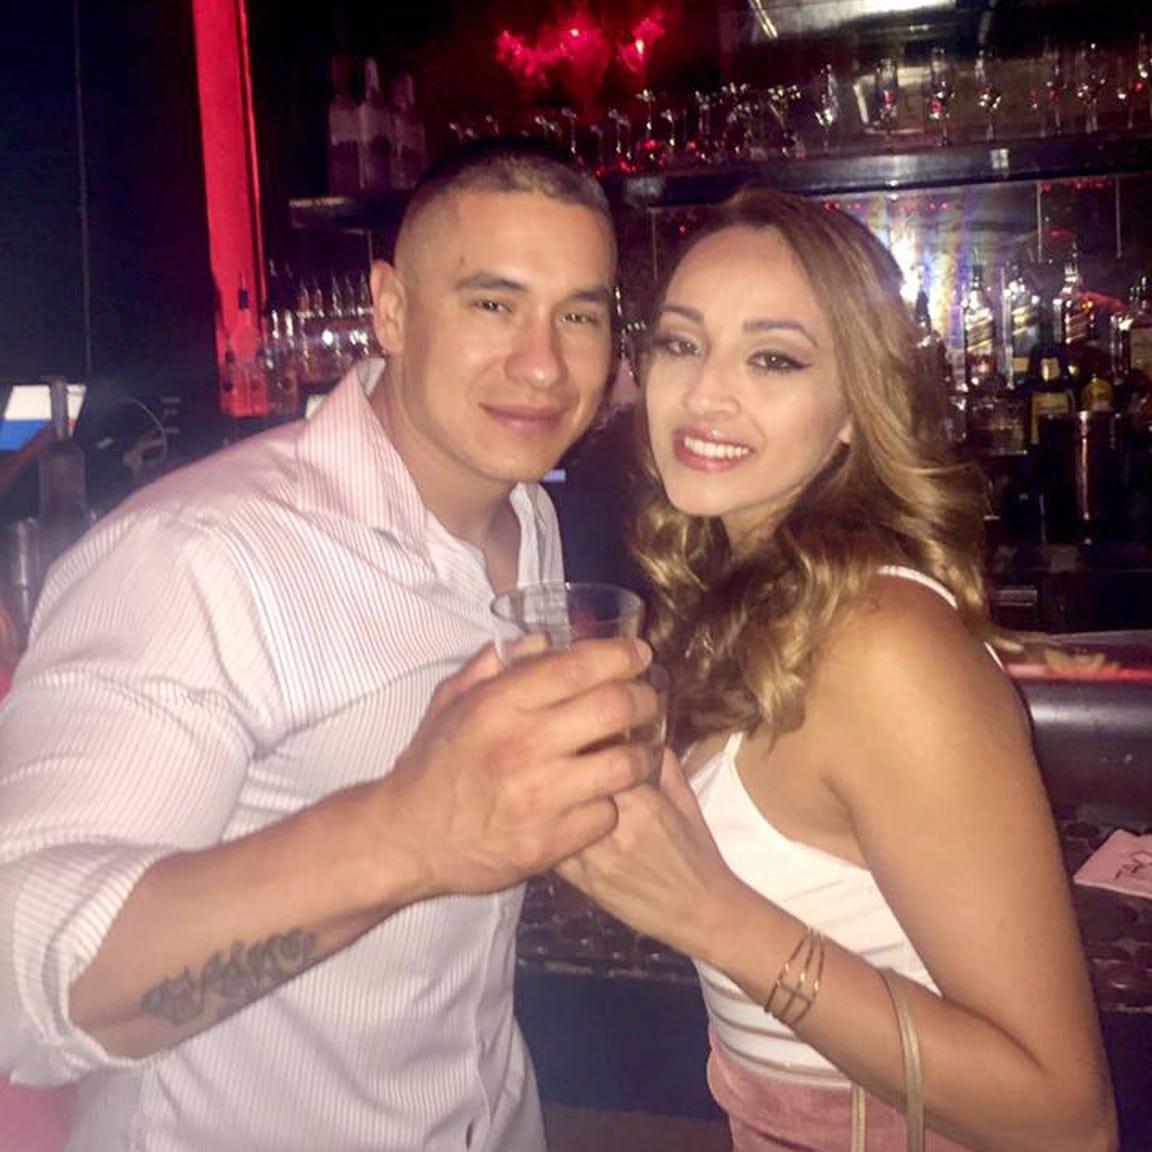 Jovanna and Frank Calzadillas on Aug. 4, 2017.